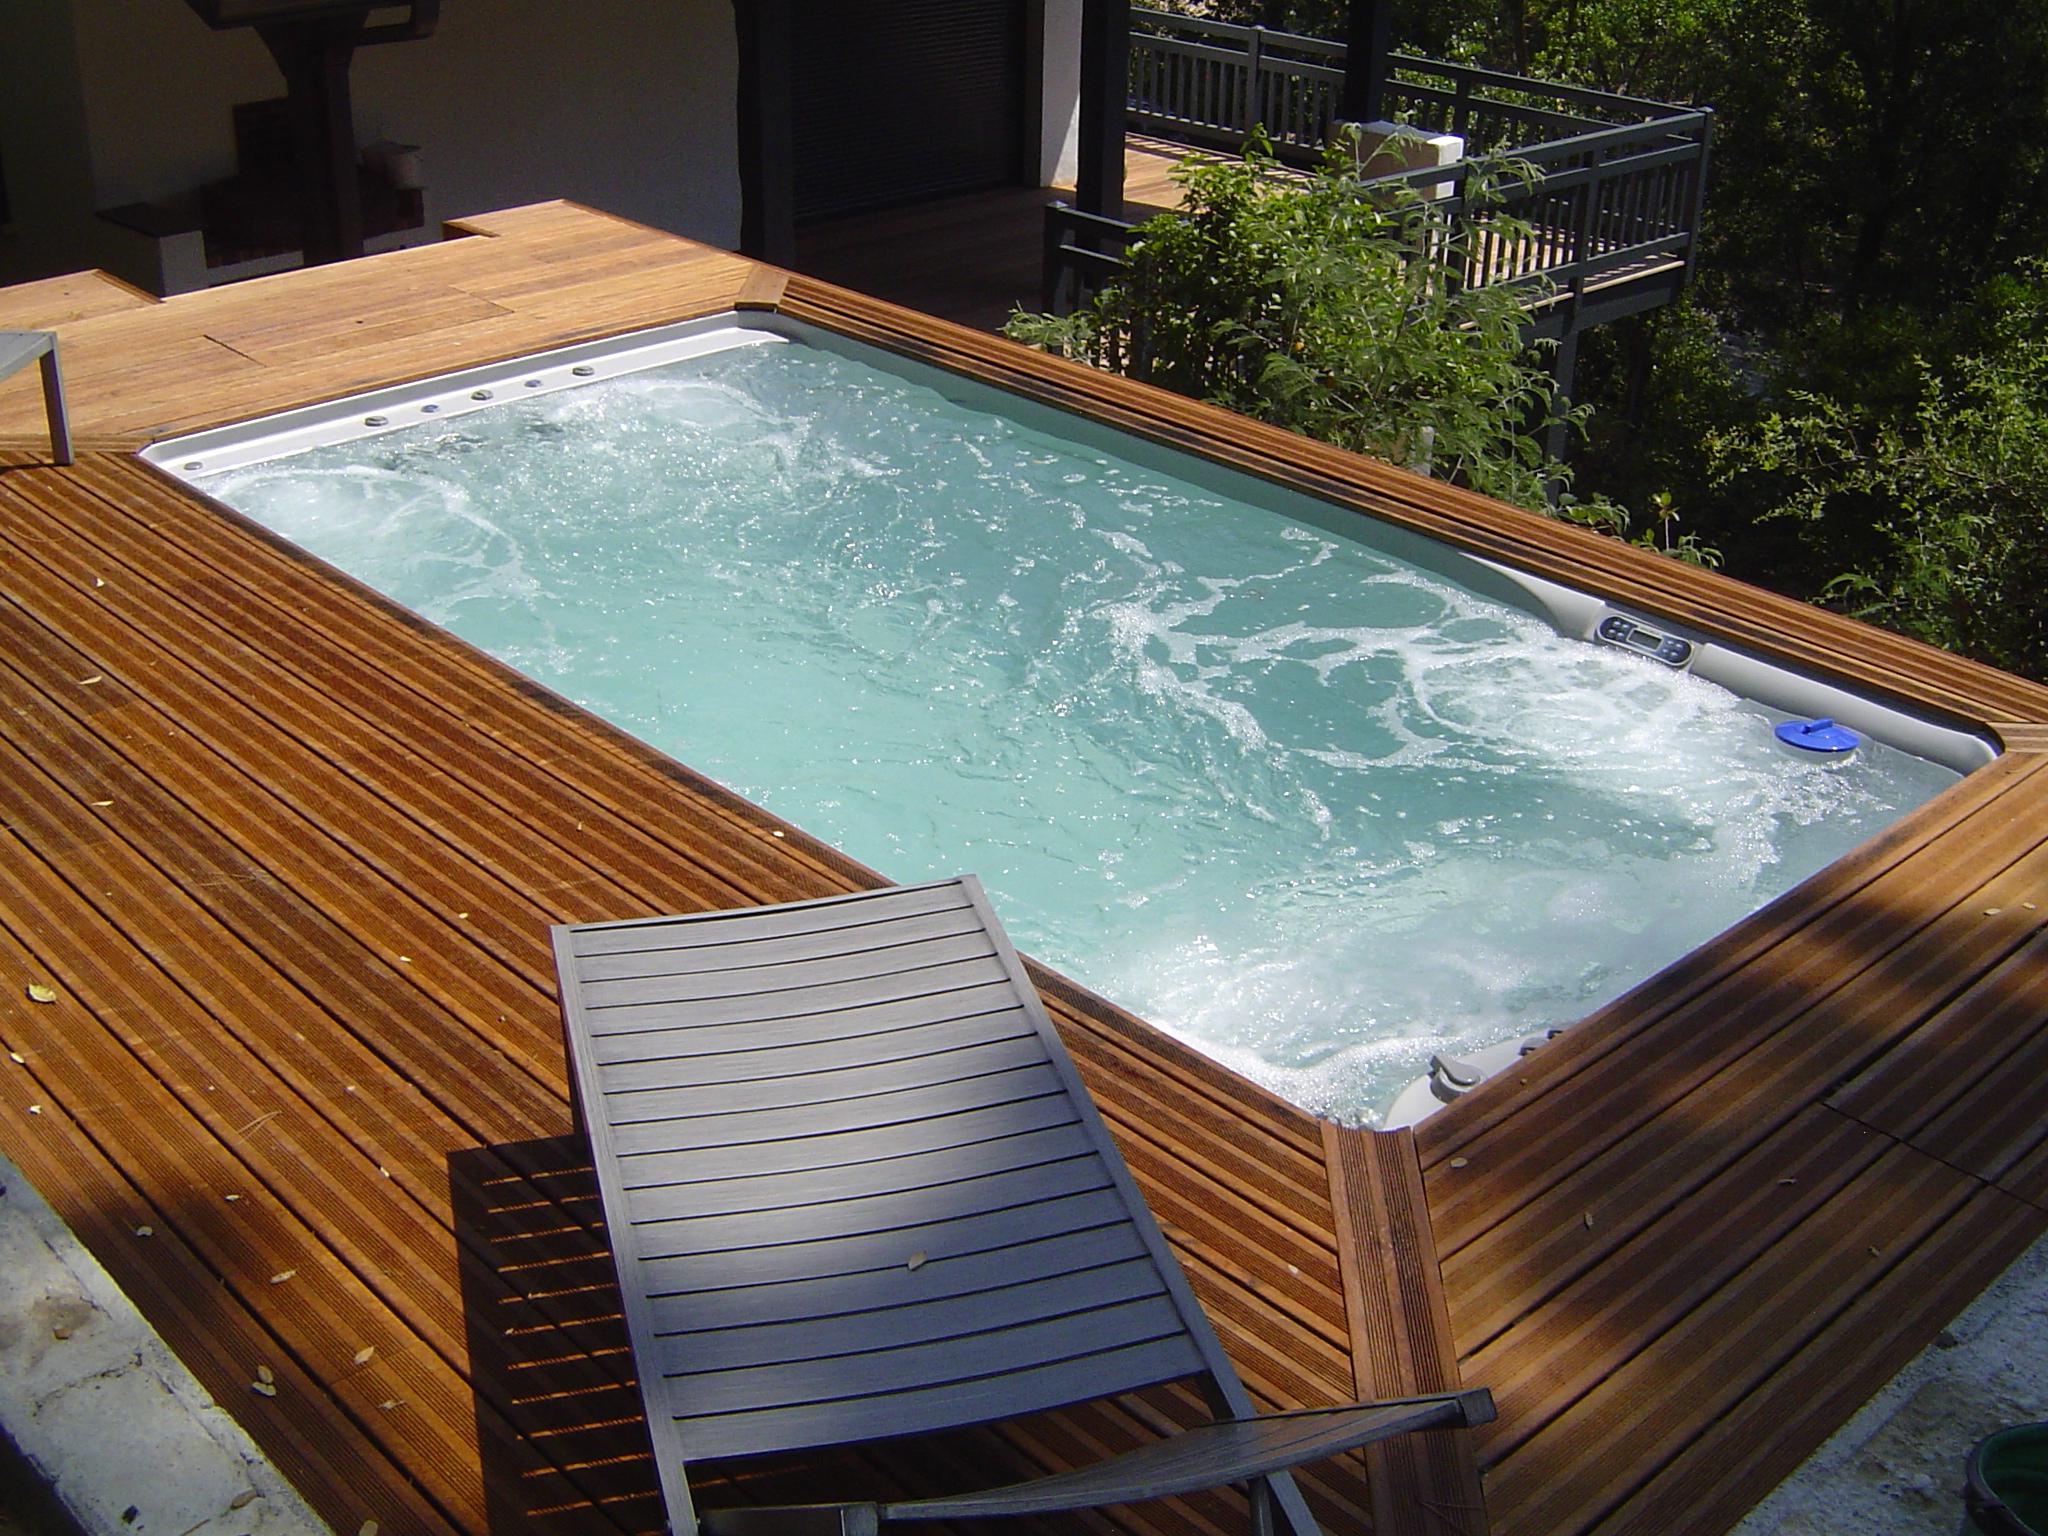 Piscine Spa Balnéo, Nage À Contre-Courant : Pretty Pool tout Piscine Contre Courant